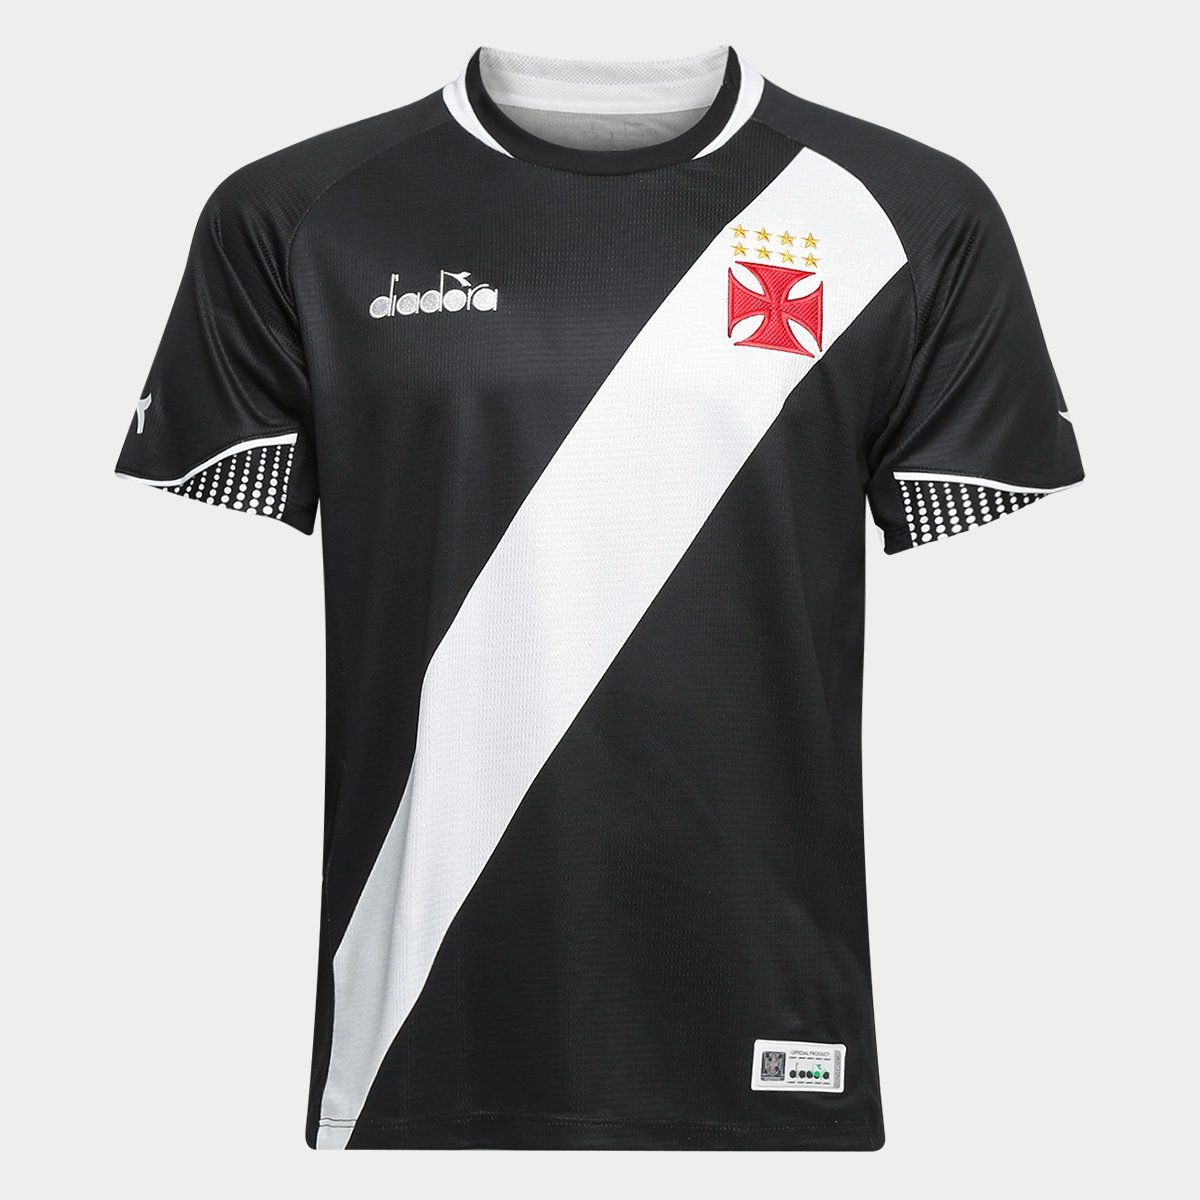 Camisa Vasco I 2018 s n° - Torcedor Diadora Masculina - Preto ... 13dd64f7385a6